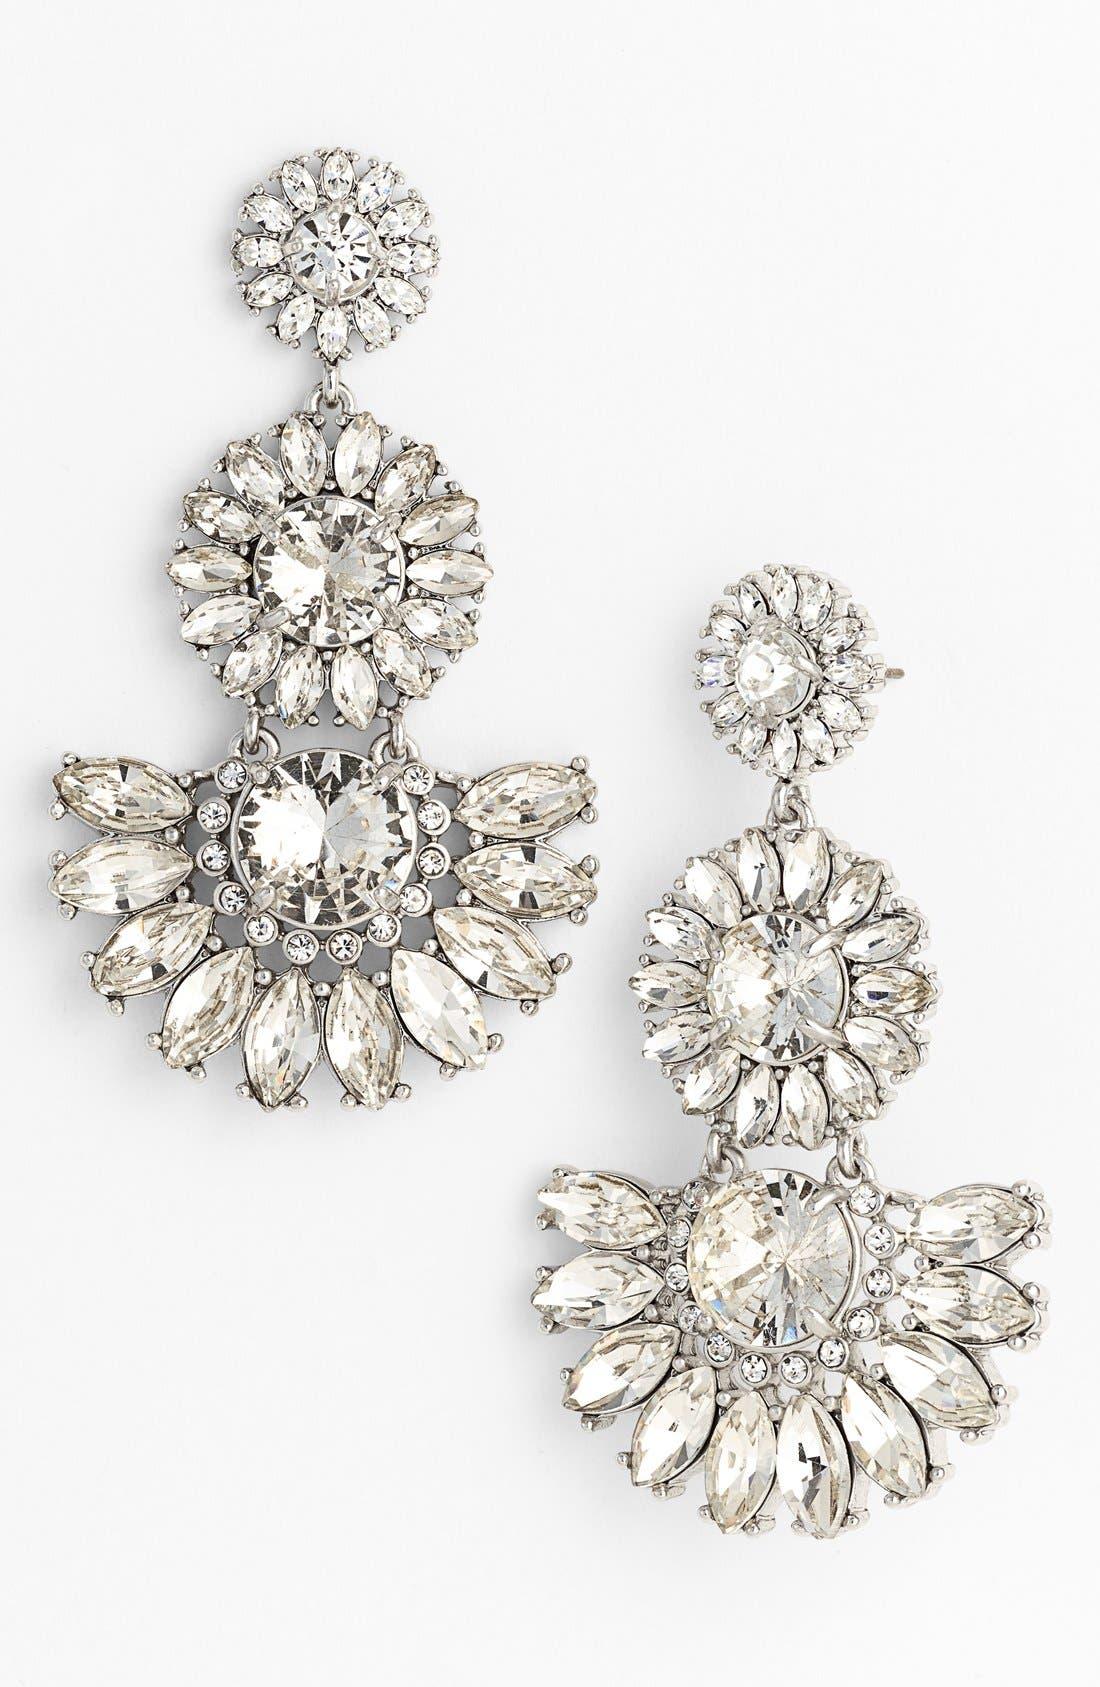 Main Image - kate spade new york 'estate garden' crystal drop earrings